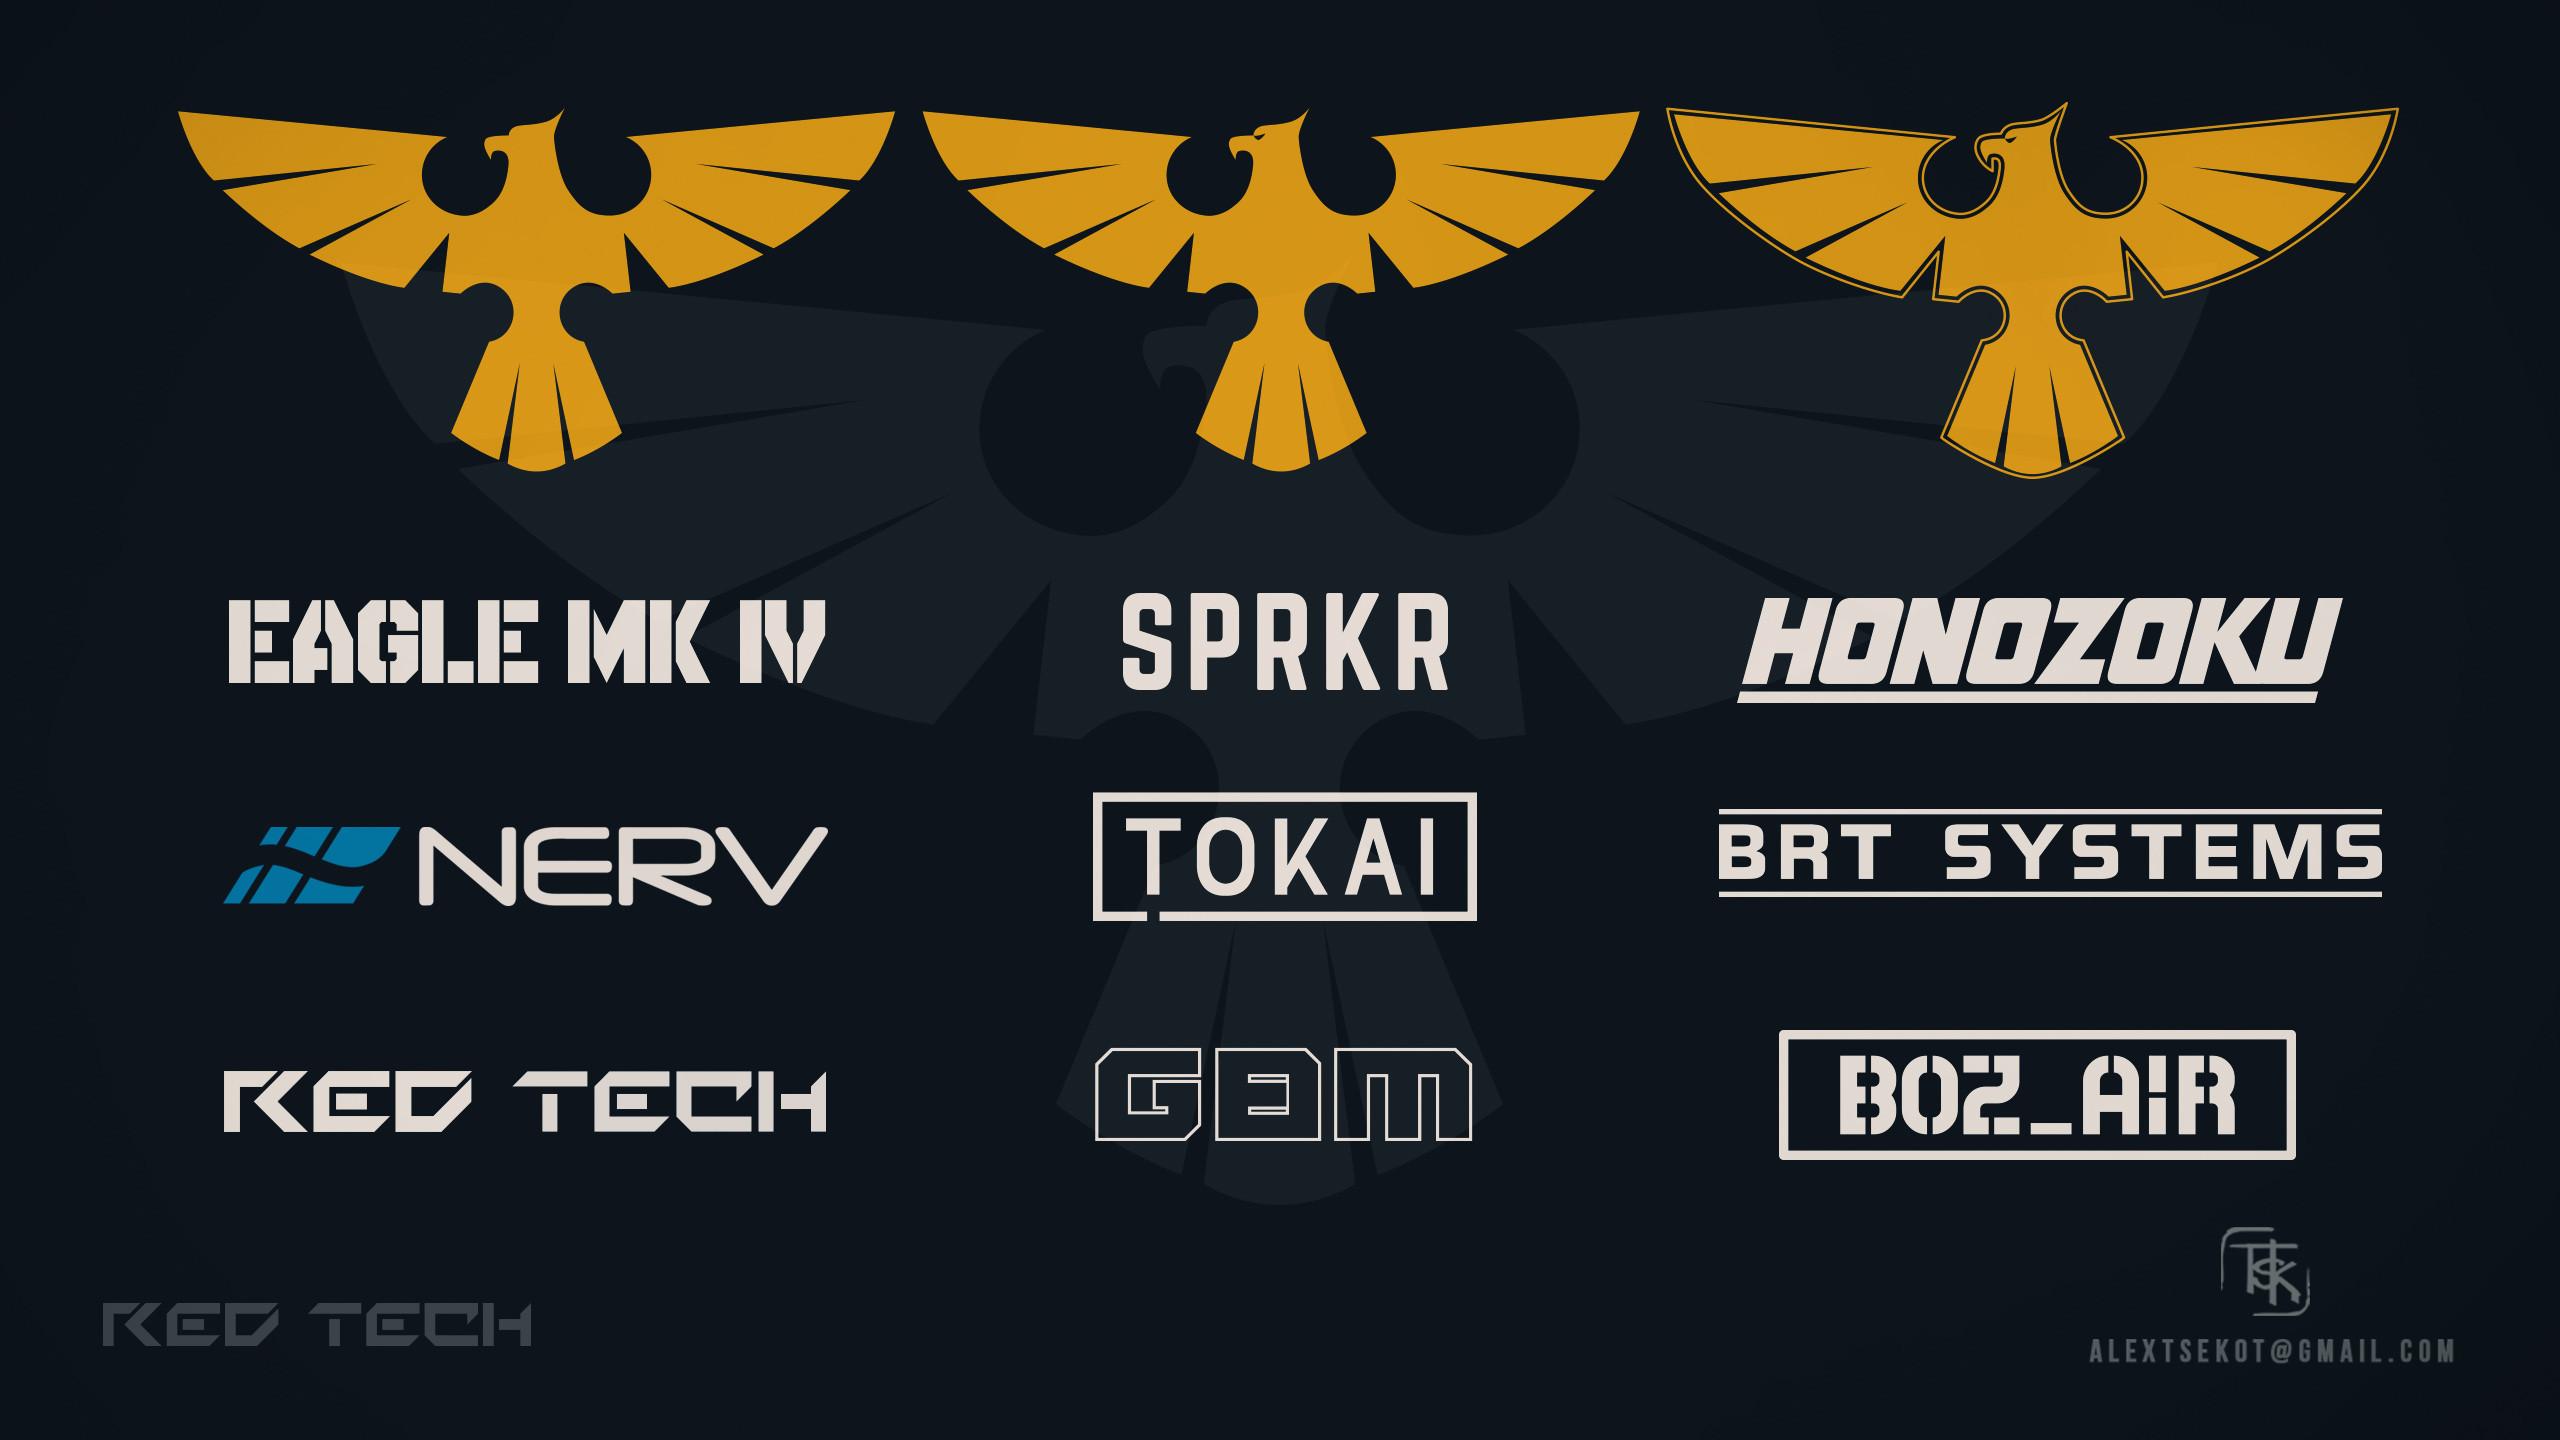 Various fictional OEM and aftermarket manufacturer logos